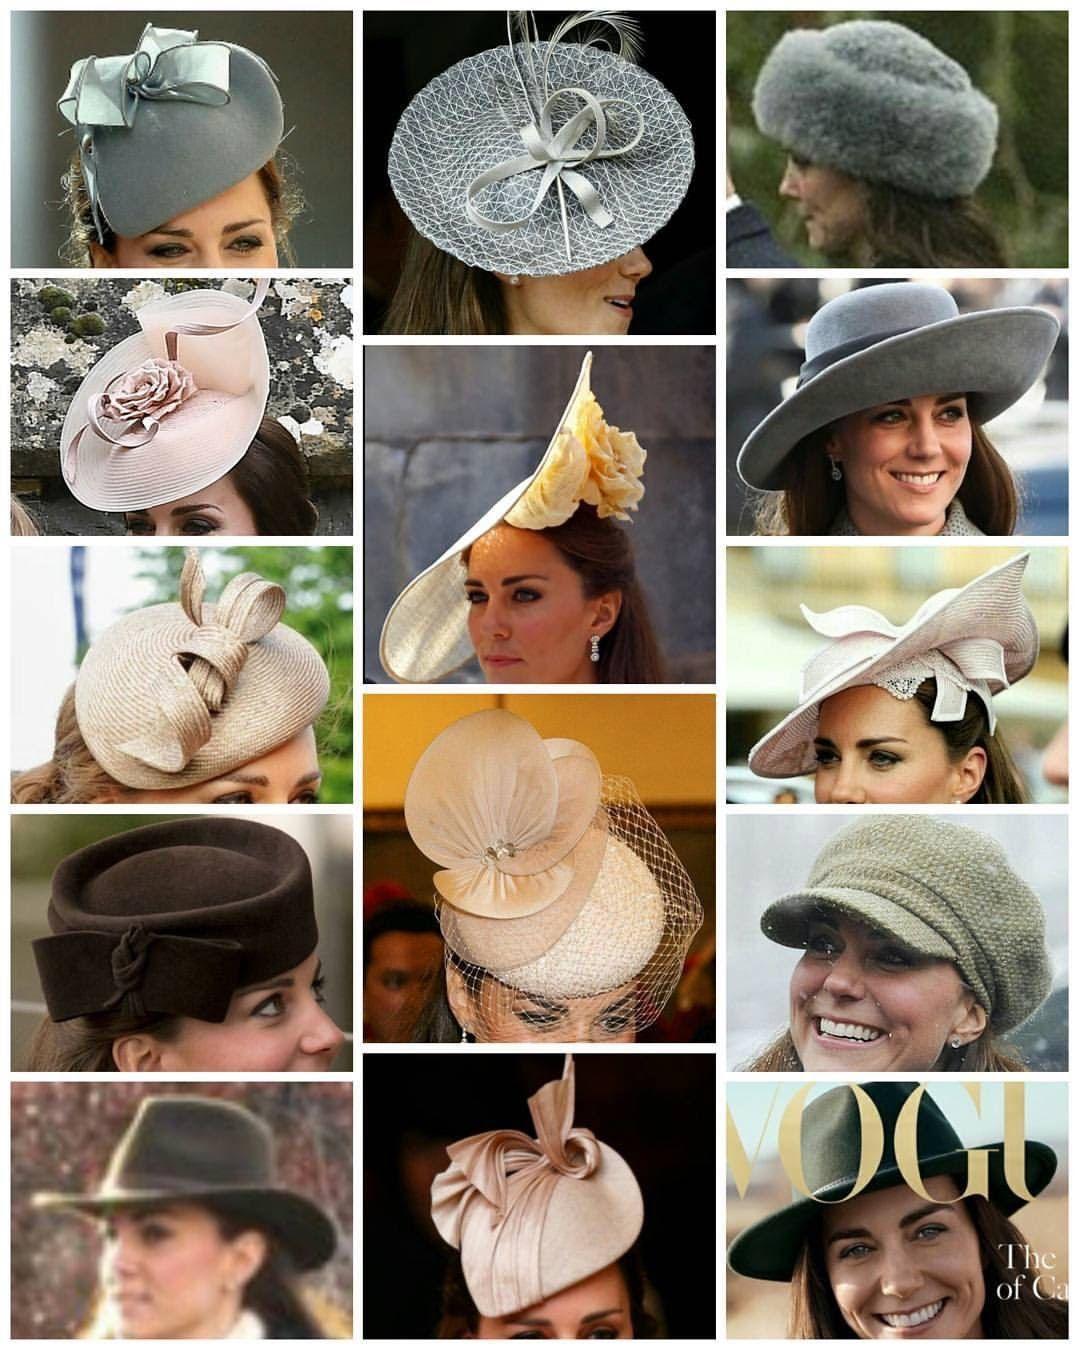 Pin De Megan DeAngelis Em Kate Middleton (Duchess